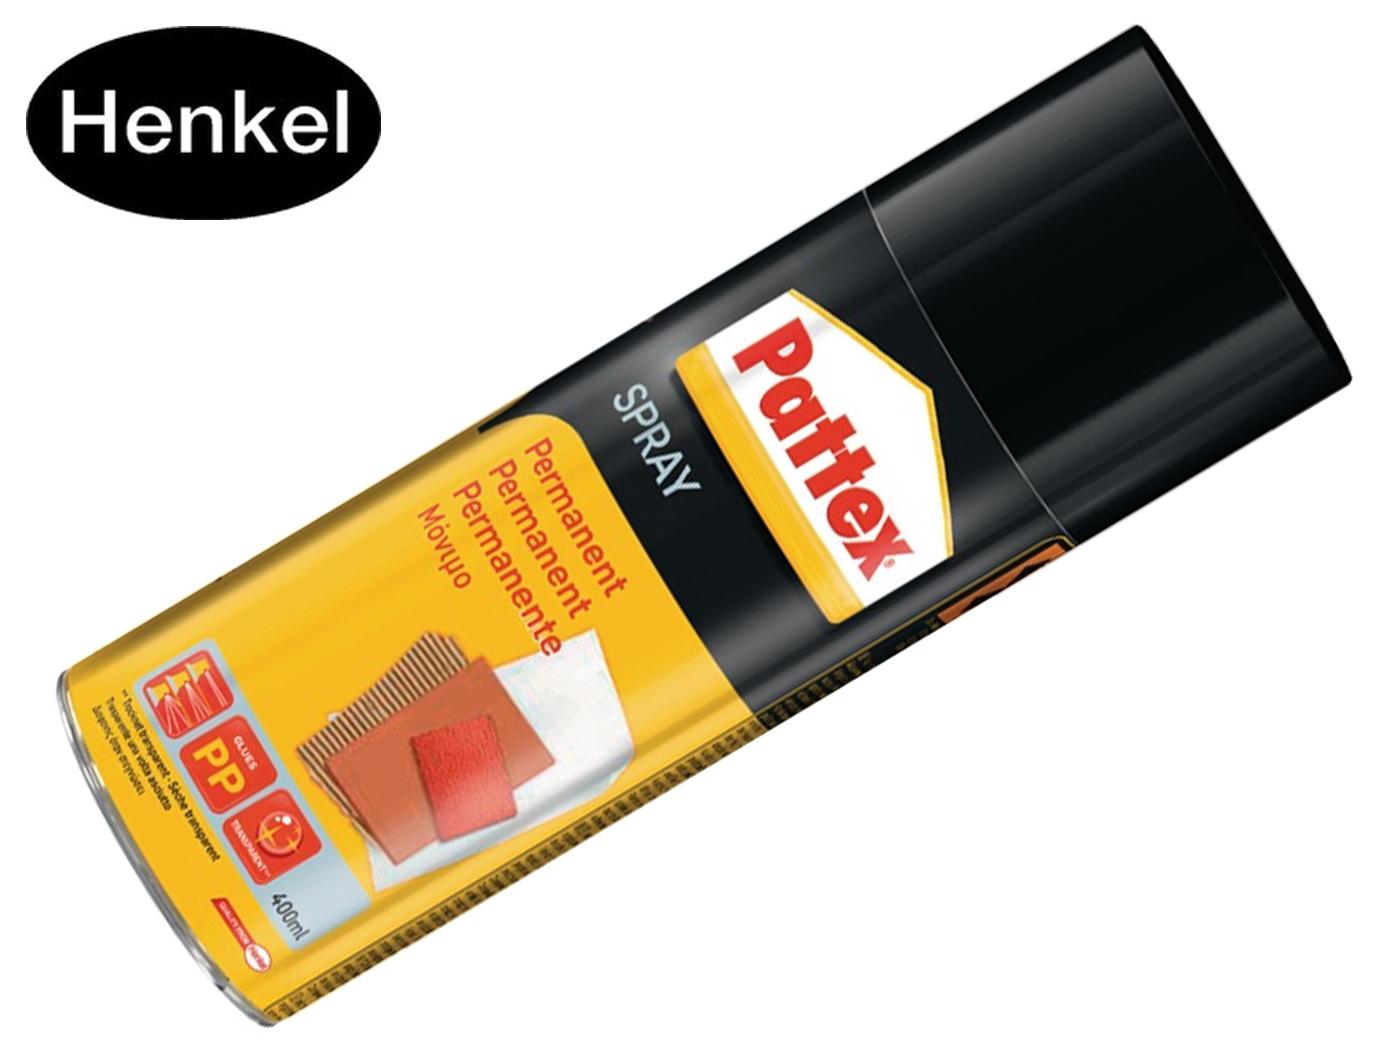 Spray Adhesive Power Spray permanente | DKMTools - DKM Tools